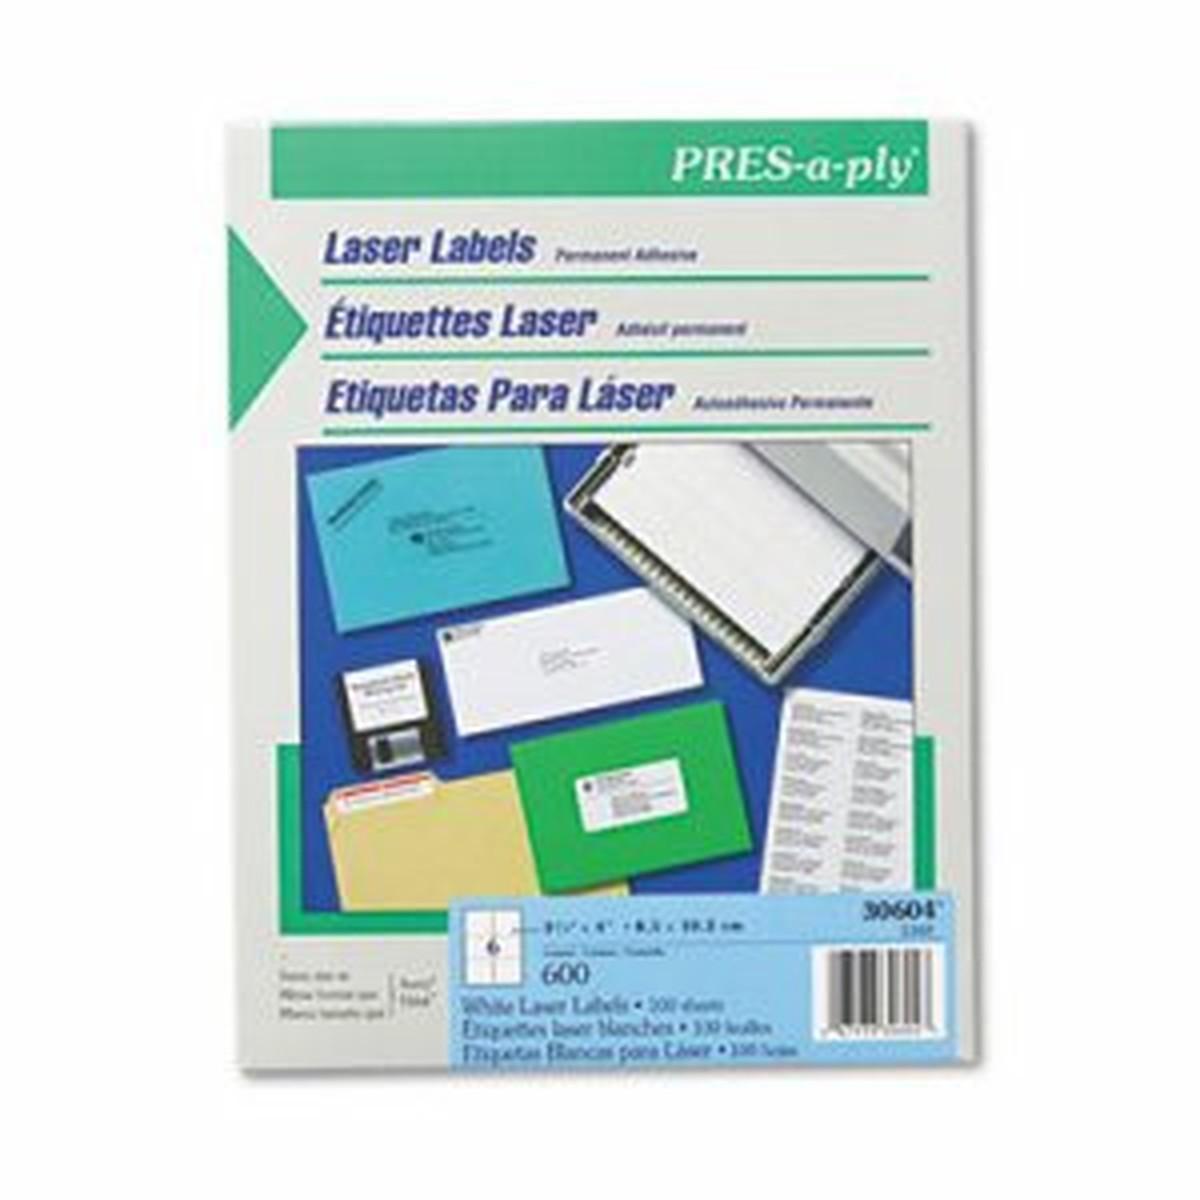 Laser Shipping Labels, 3 1/3 x 4, White, 600/Box